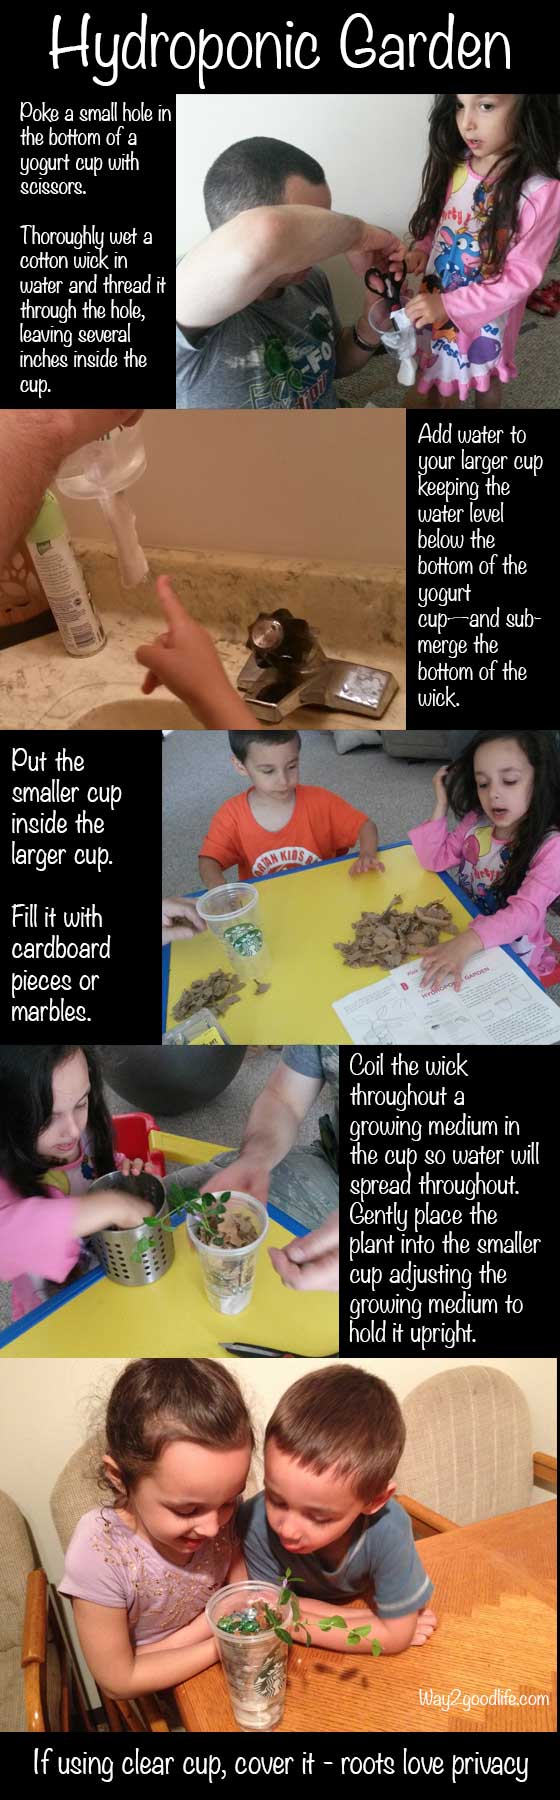 hydroponics-wick-system-children